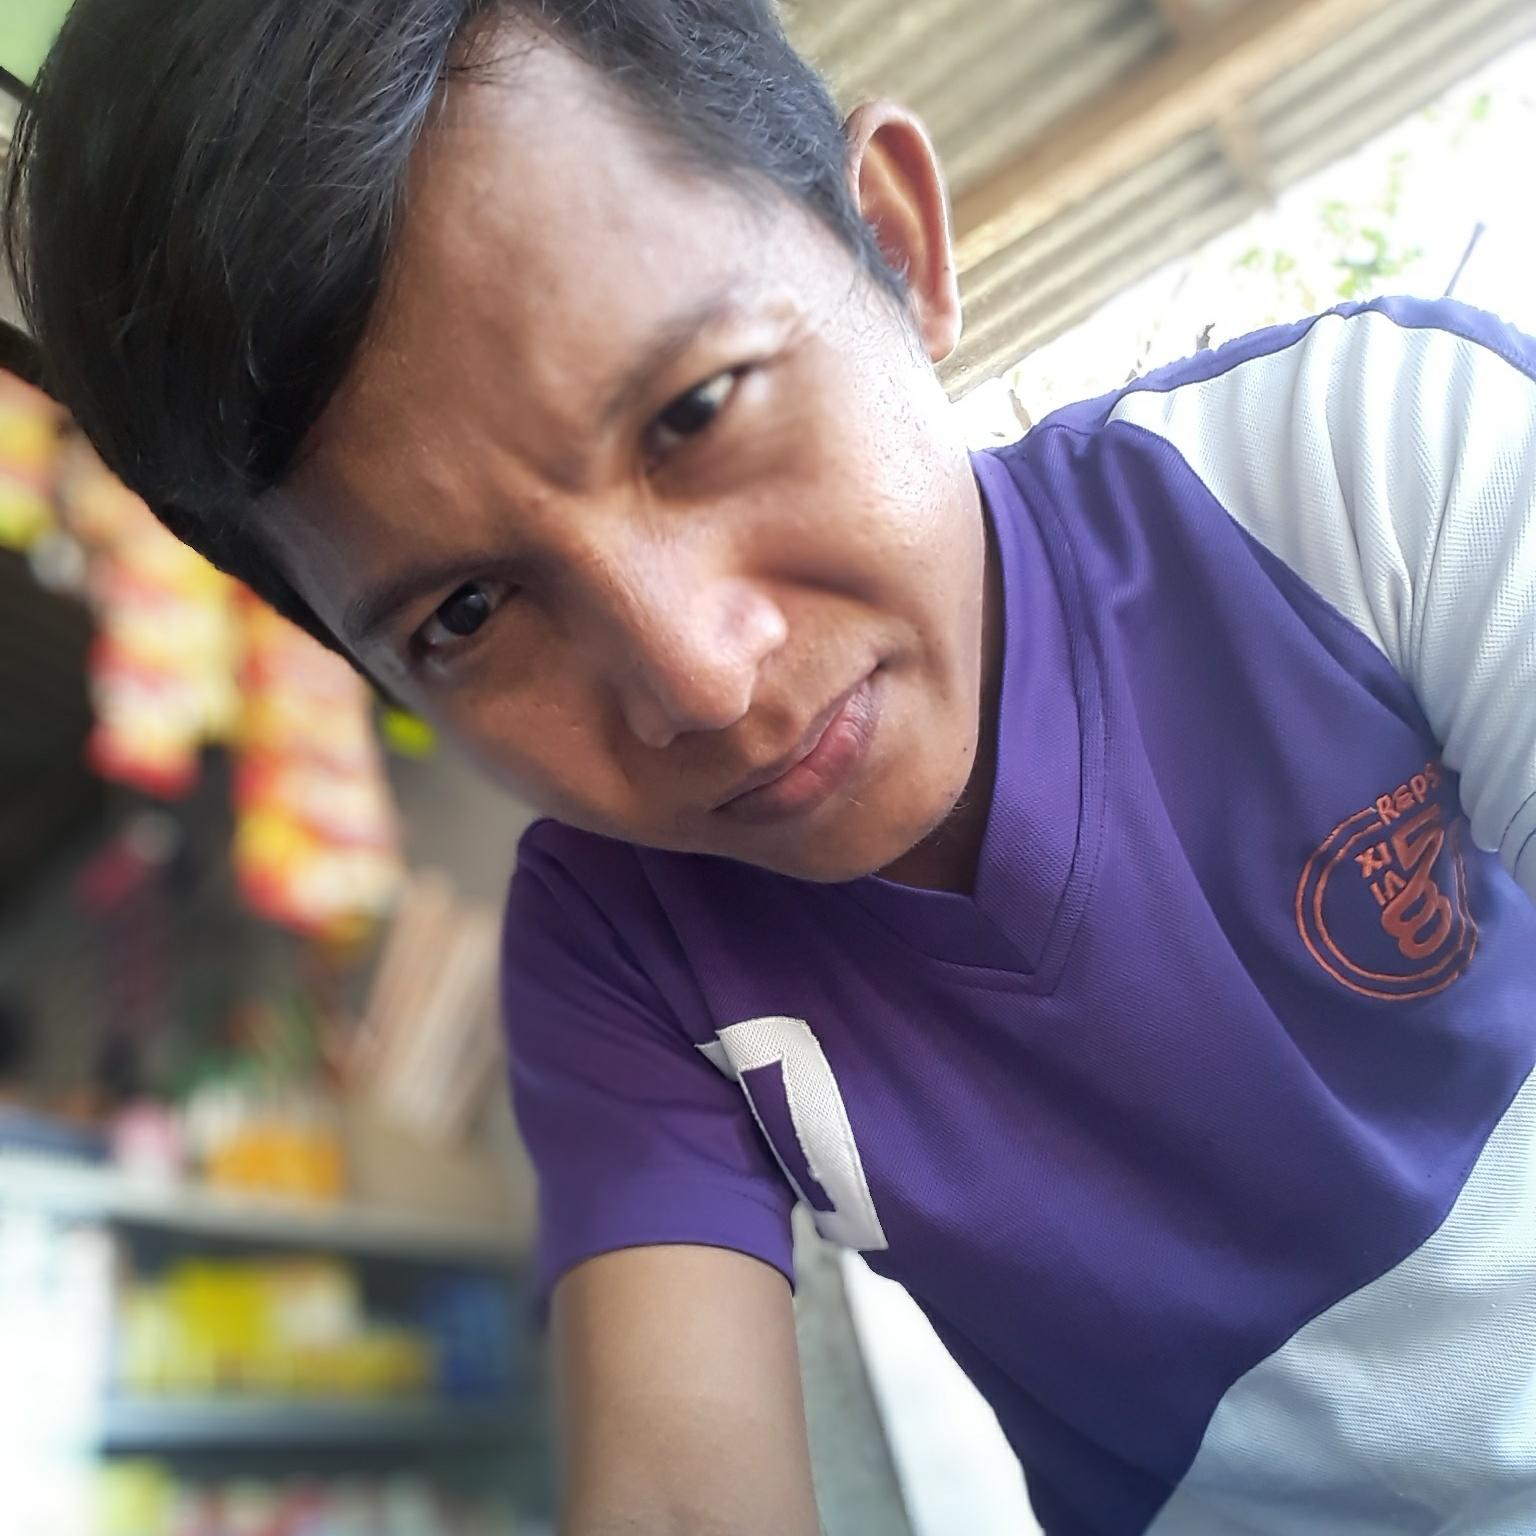 ChandCFC